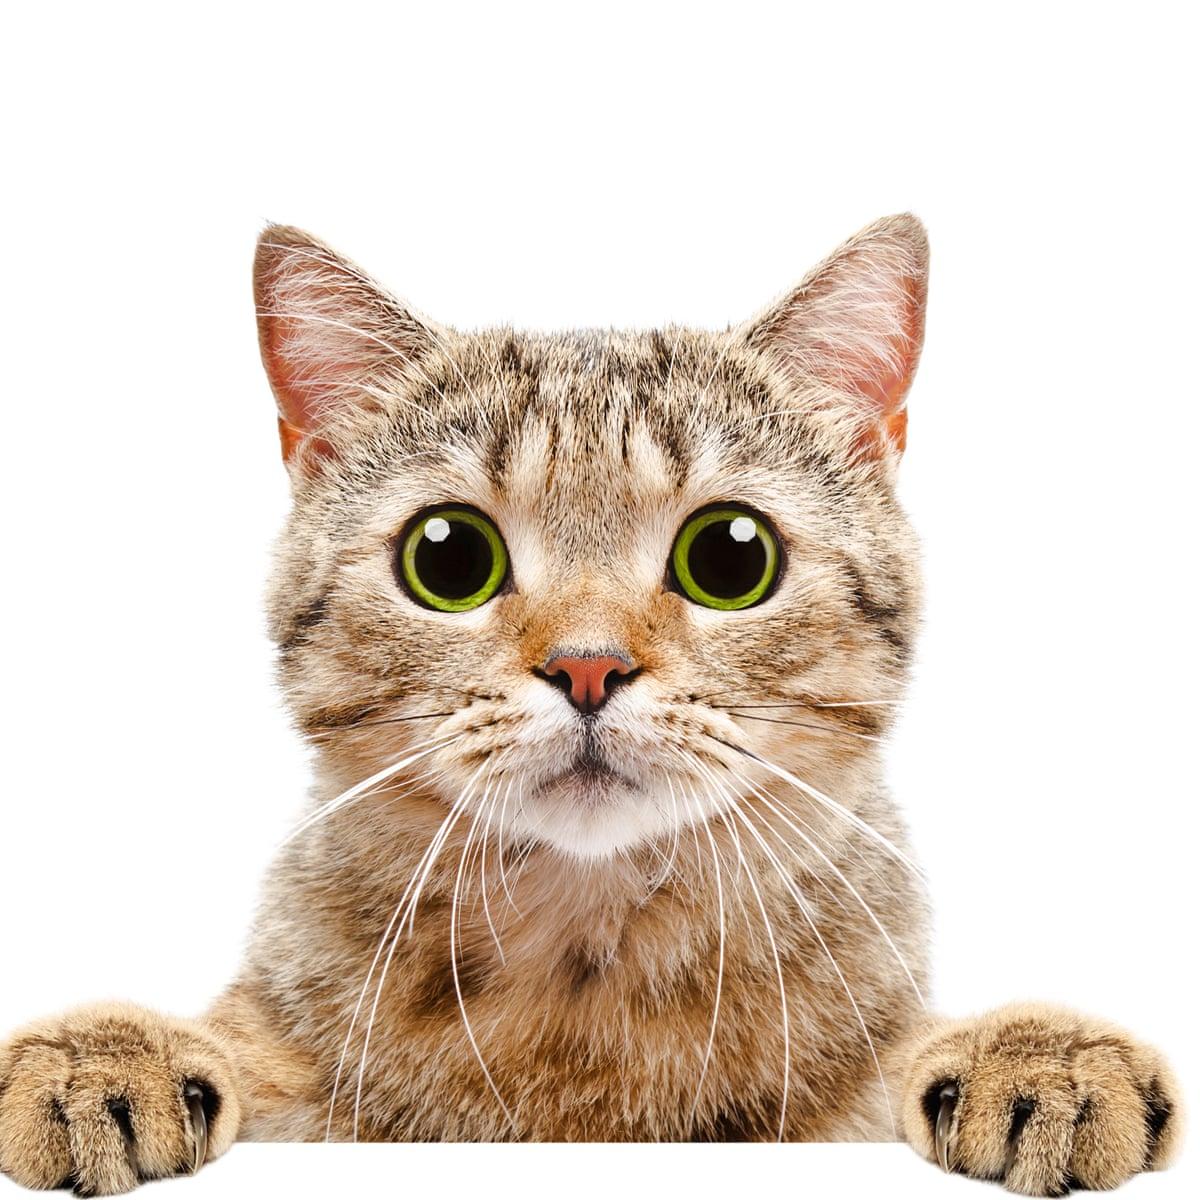 Download Adorable Cat Pictures Photos Images pib_sfrX8